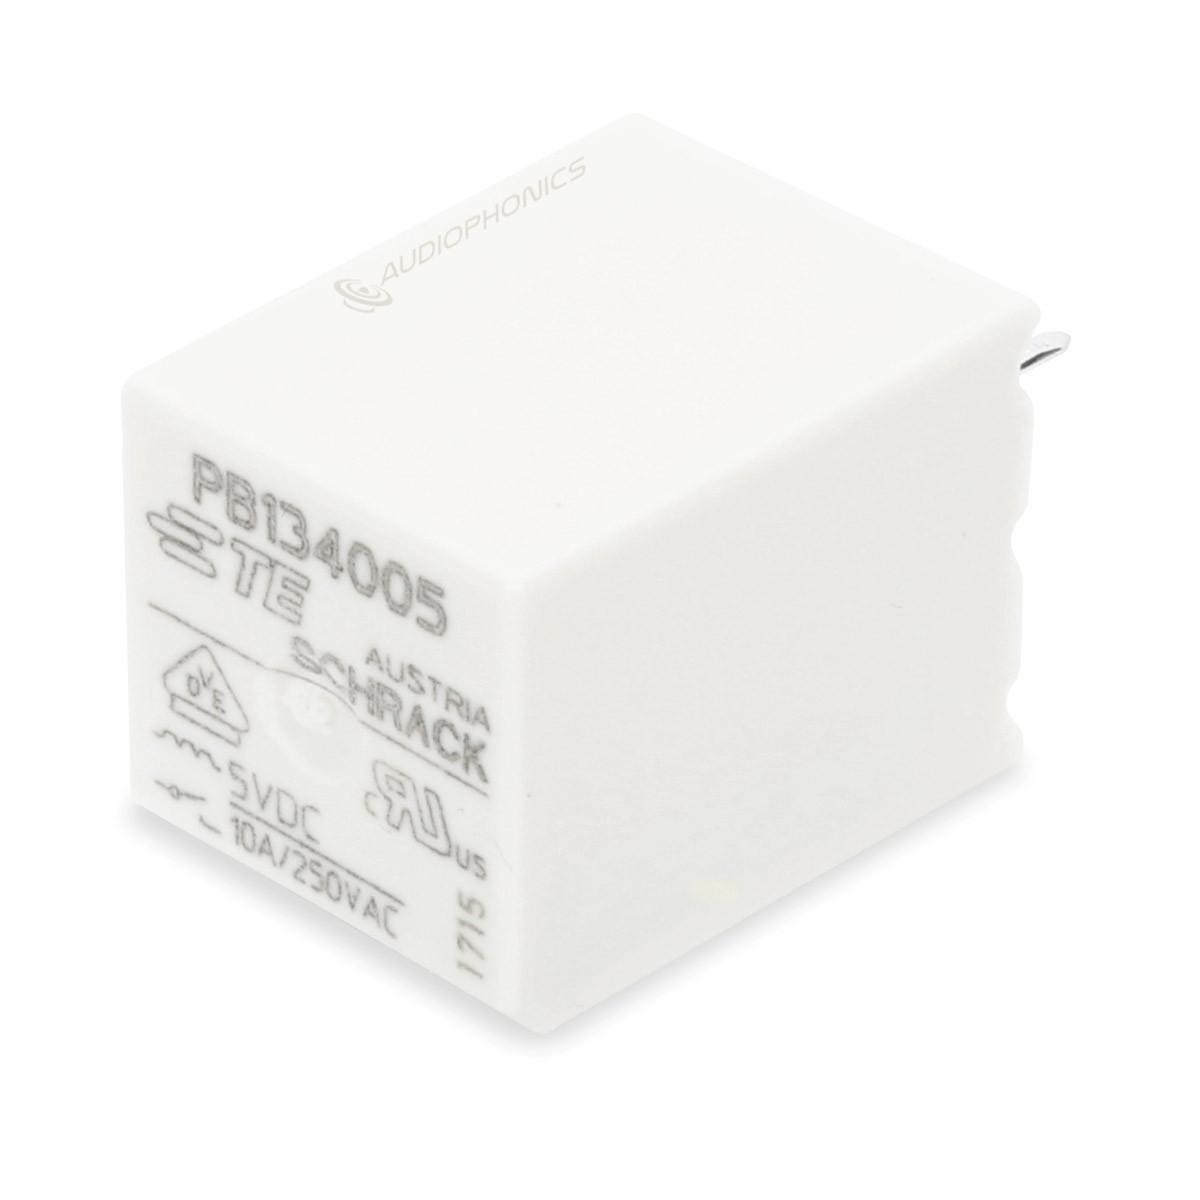 SCHRACK PB134005 Power Relay SPST-NO 5VDC 10A